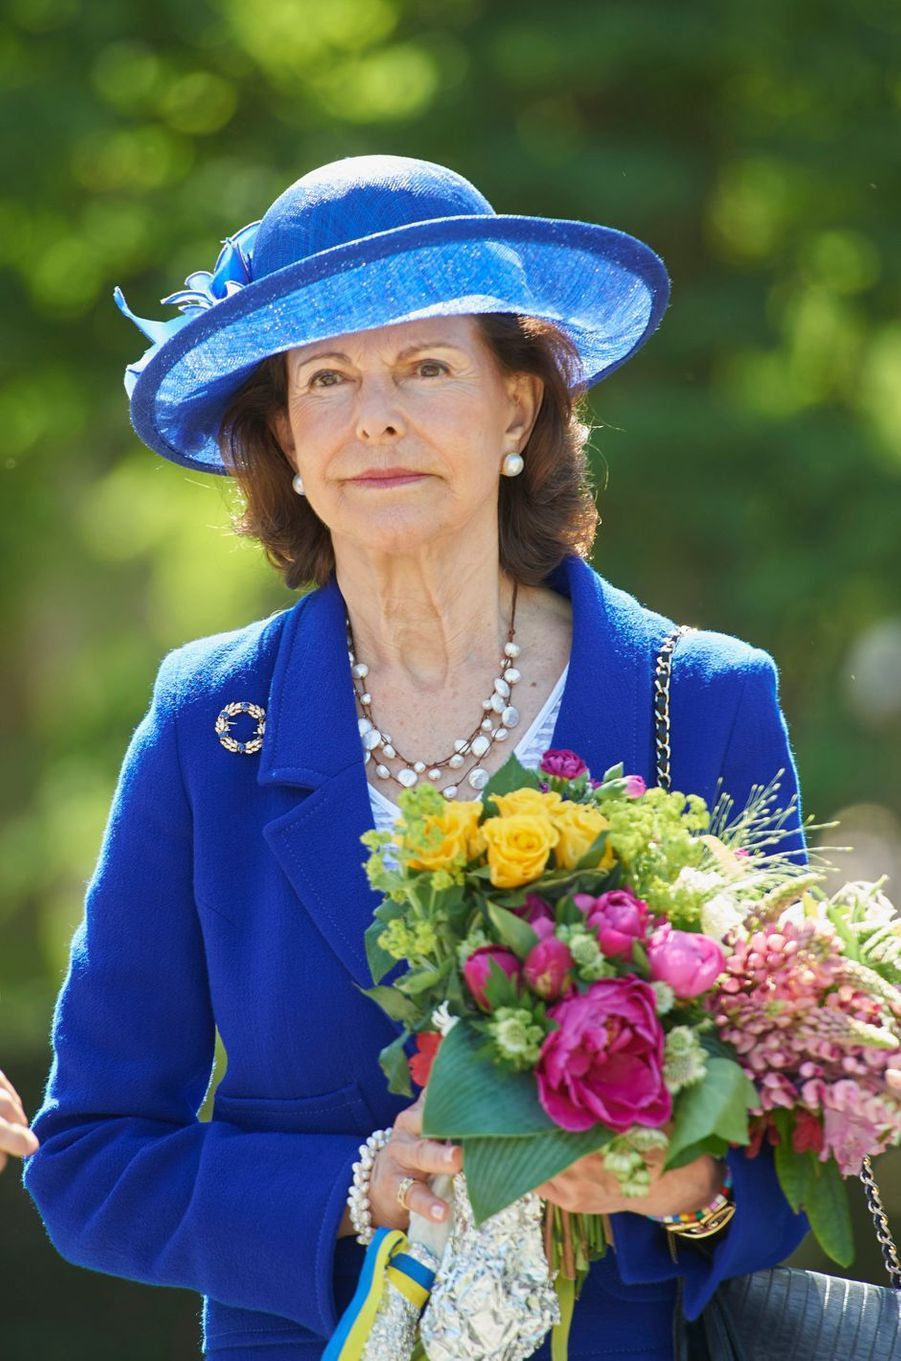 La reine Silvia de Suède au château Sofiero à Helsingborg, le 6 juin 2016